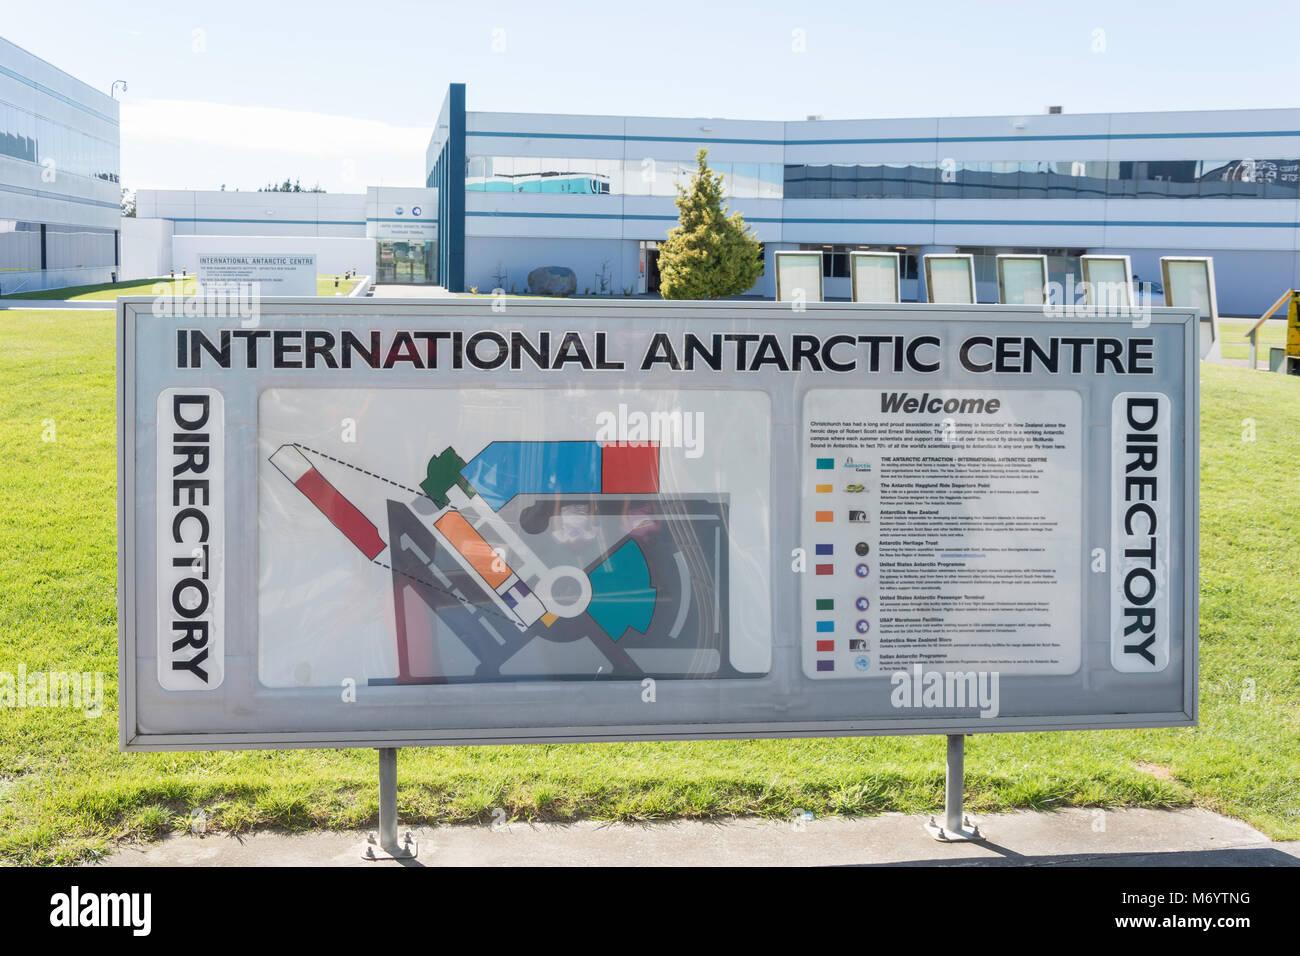 Directory sign at International Antarctic Centre, Orchard Road, Harewood, Christchurch, Canterbury, New Zealand - Stock Image